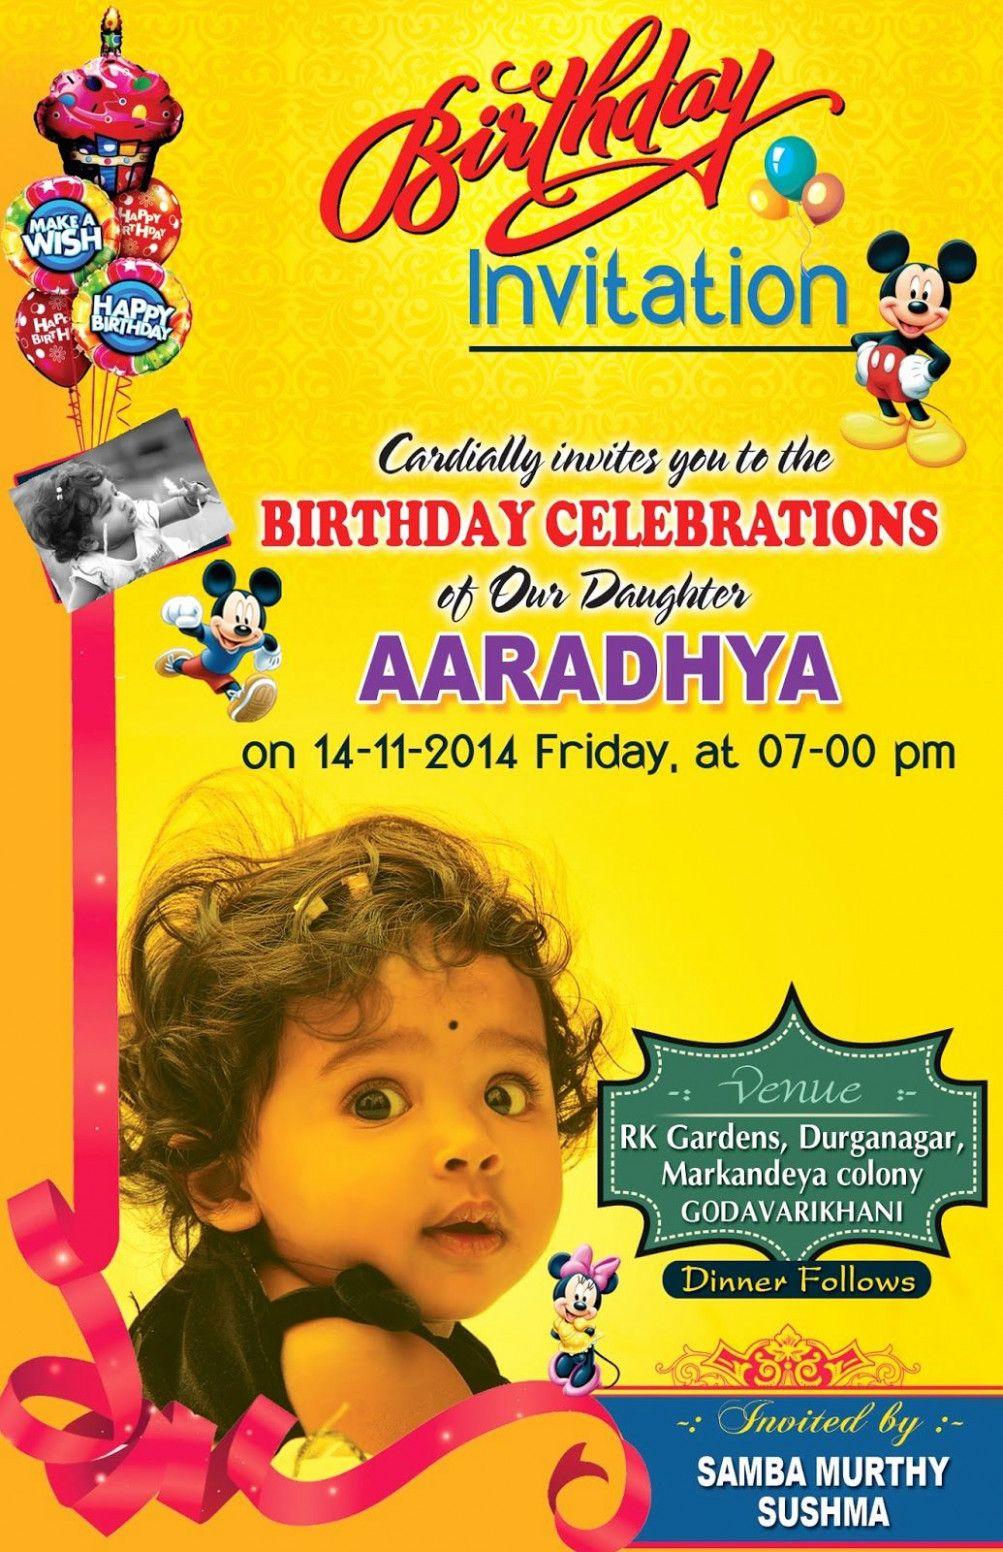 17 Design Invitation Happy Birthday Card Template Don't